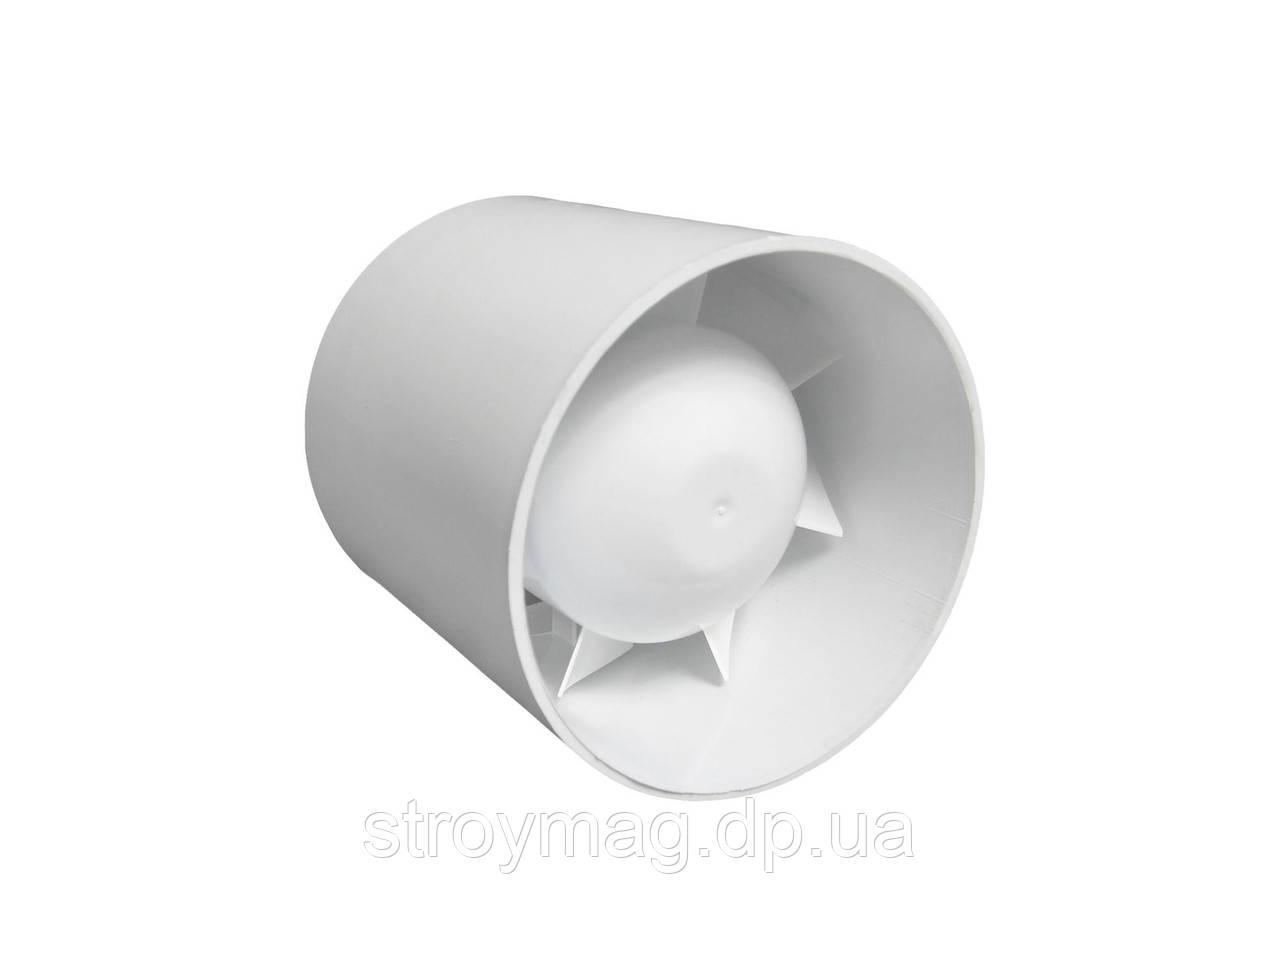 Вентилятор канальний Dospel EURO 2 120 (007-0052)